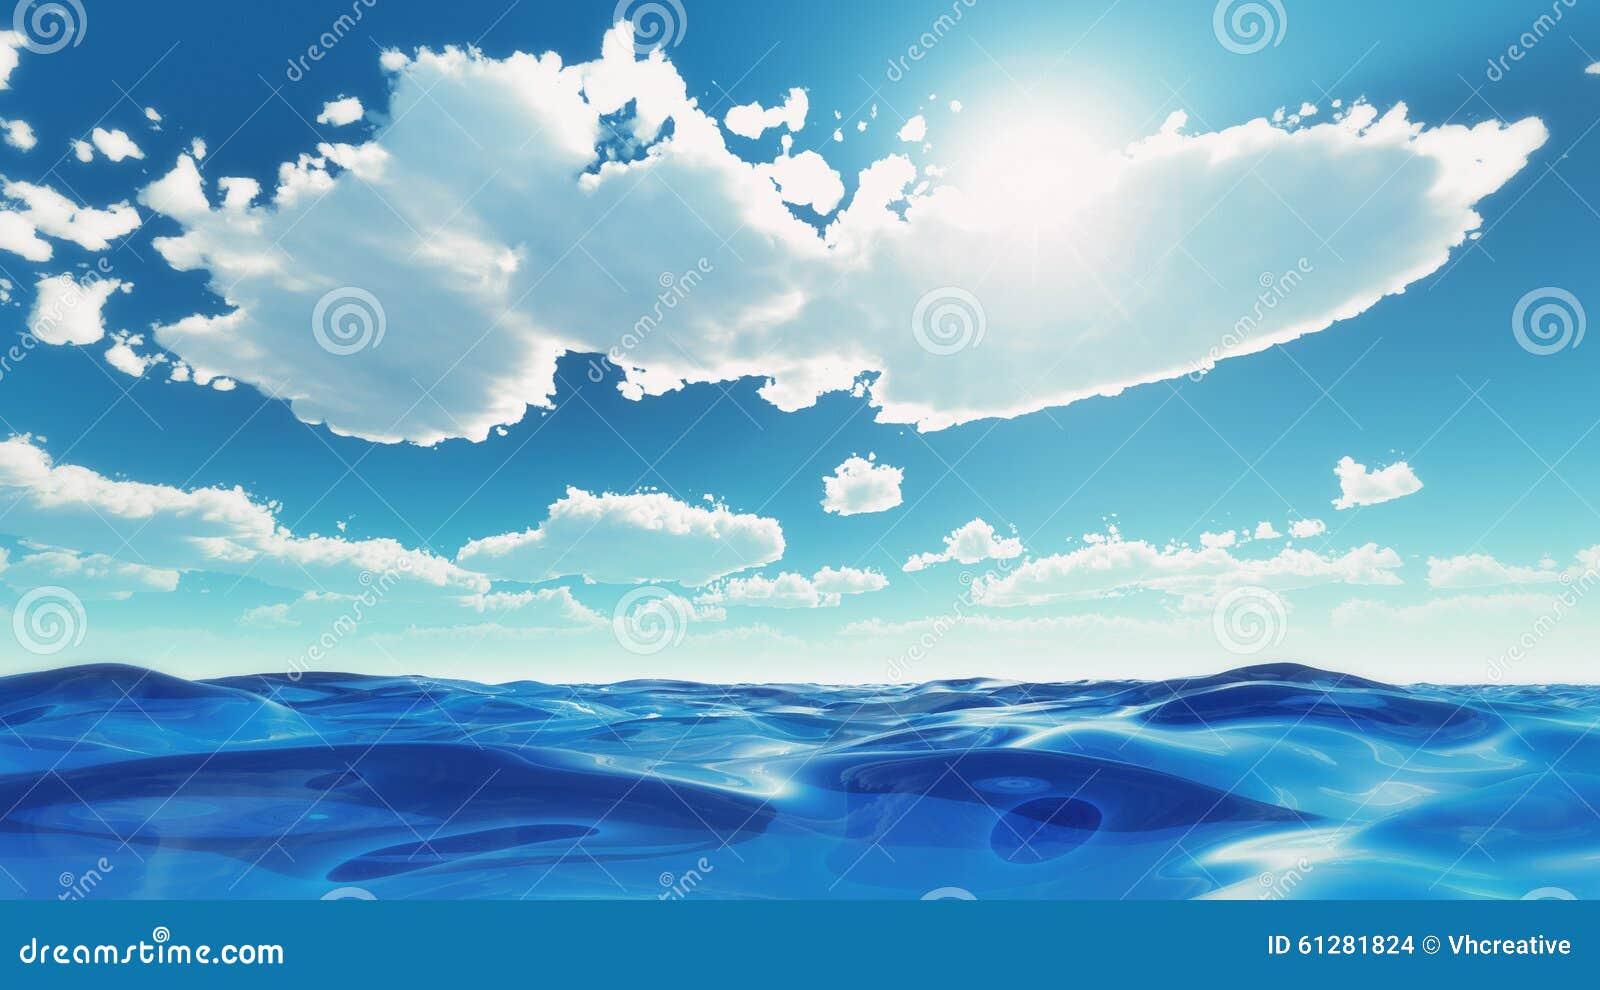 Sea waves under summer sky